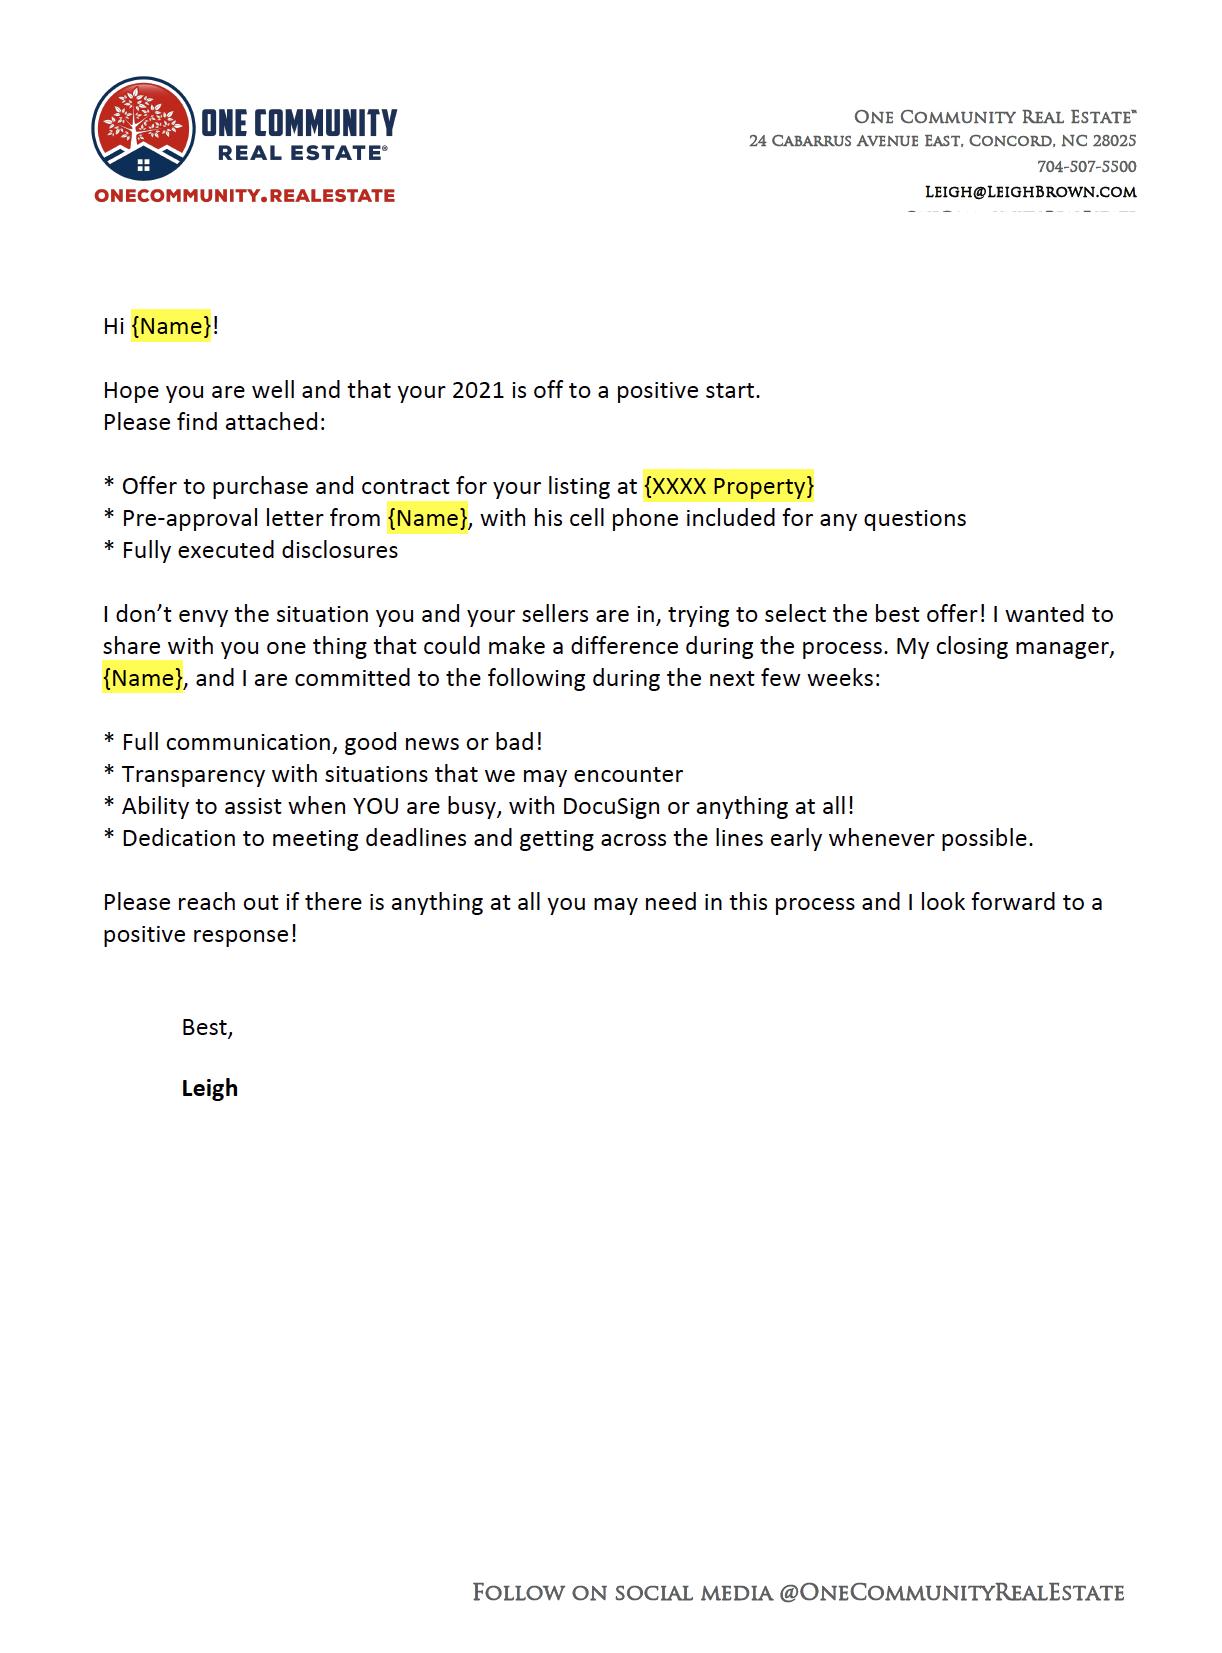 Buyer Agent Letter